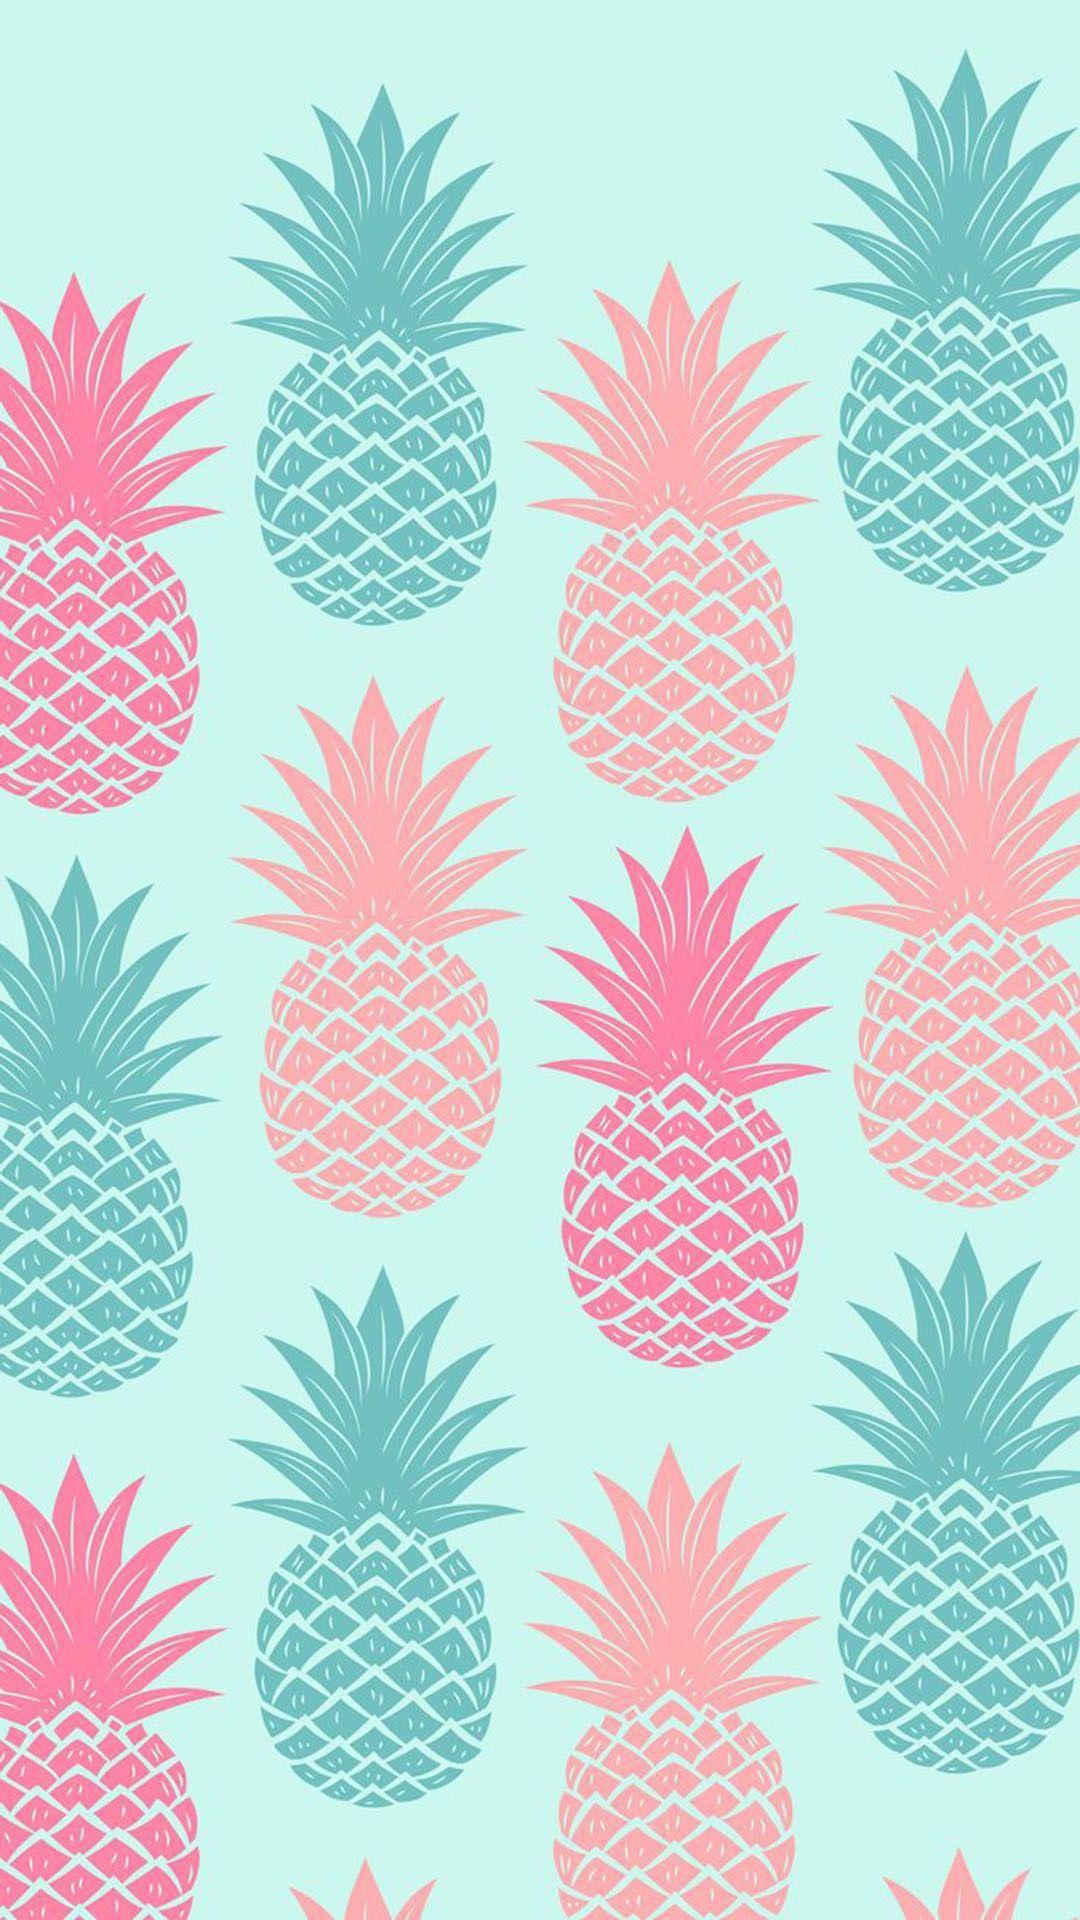 Good Wallpaper Home Screen Pineapple - 57881915b84760129f256bb940ea67f7  Trends_549399.jpg